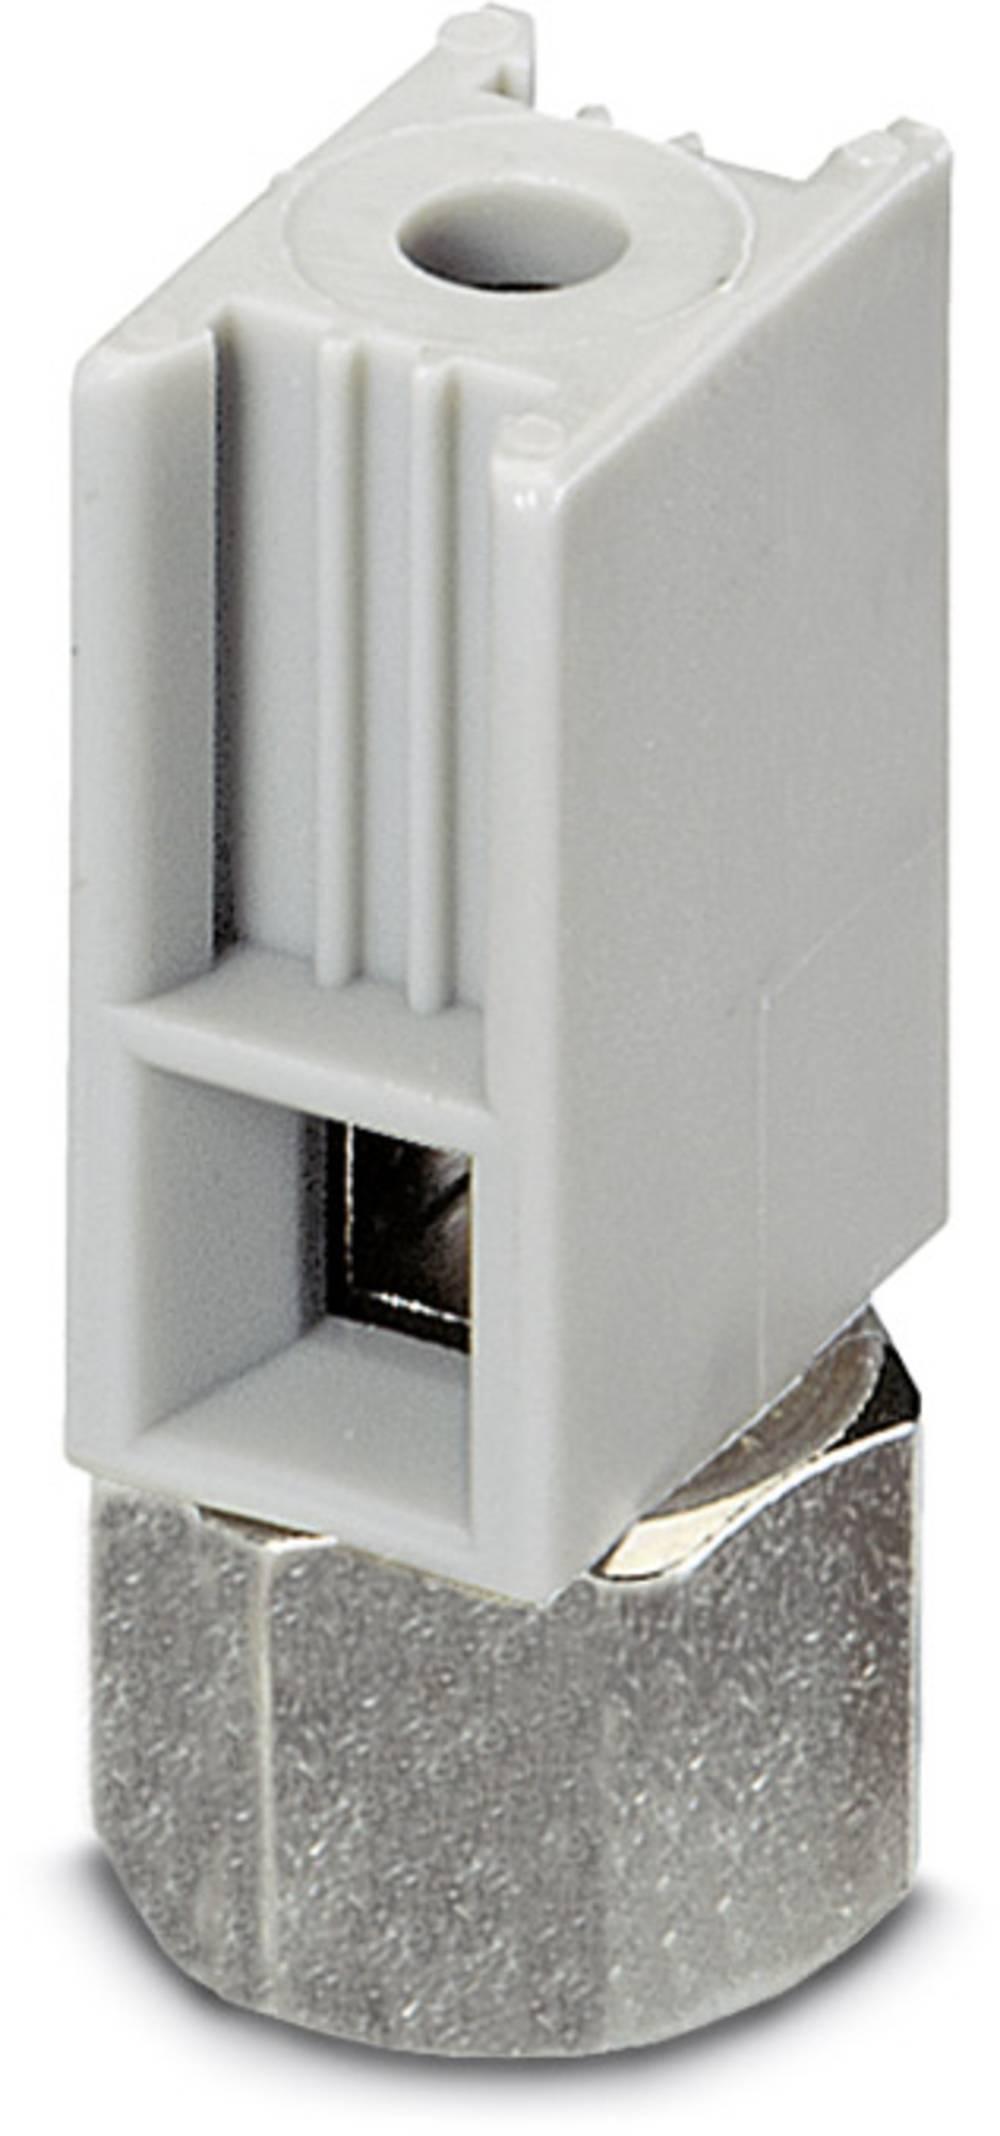 LA 4-M10 - Conductor mor LA 4-M10 Phoenix Contact Indhold: 10 stk